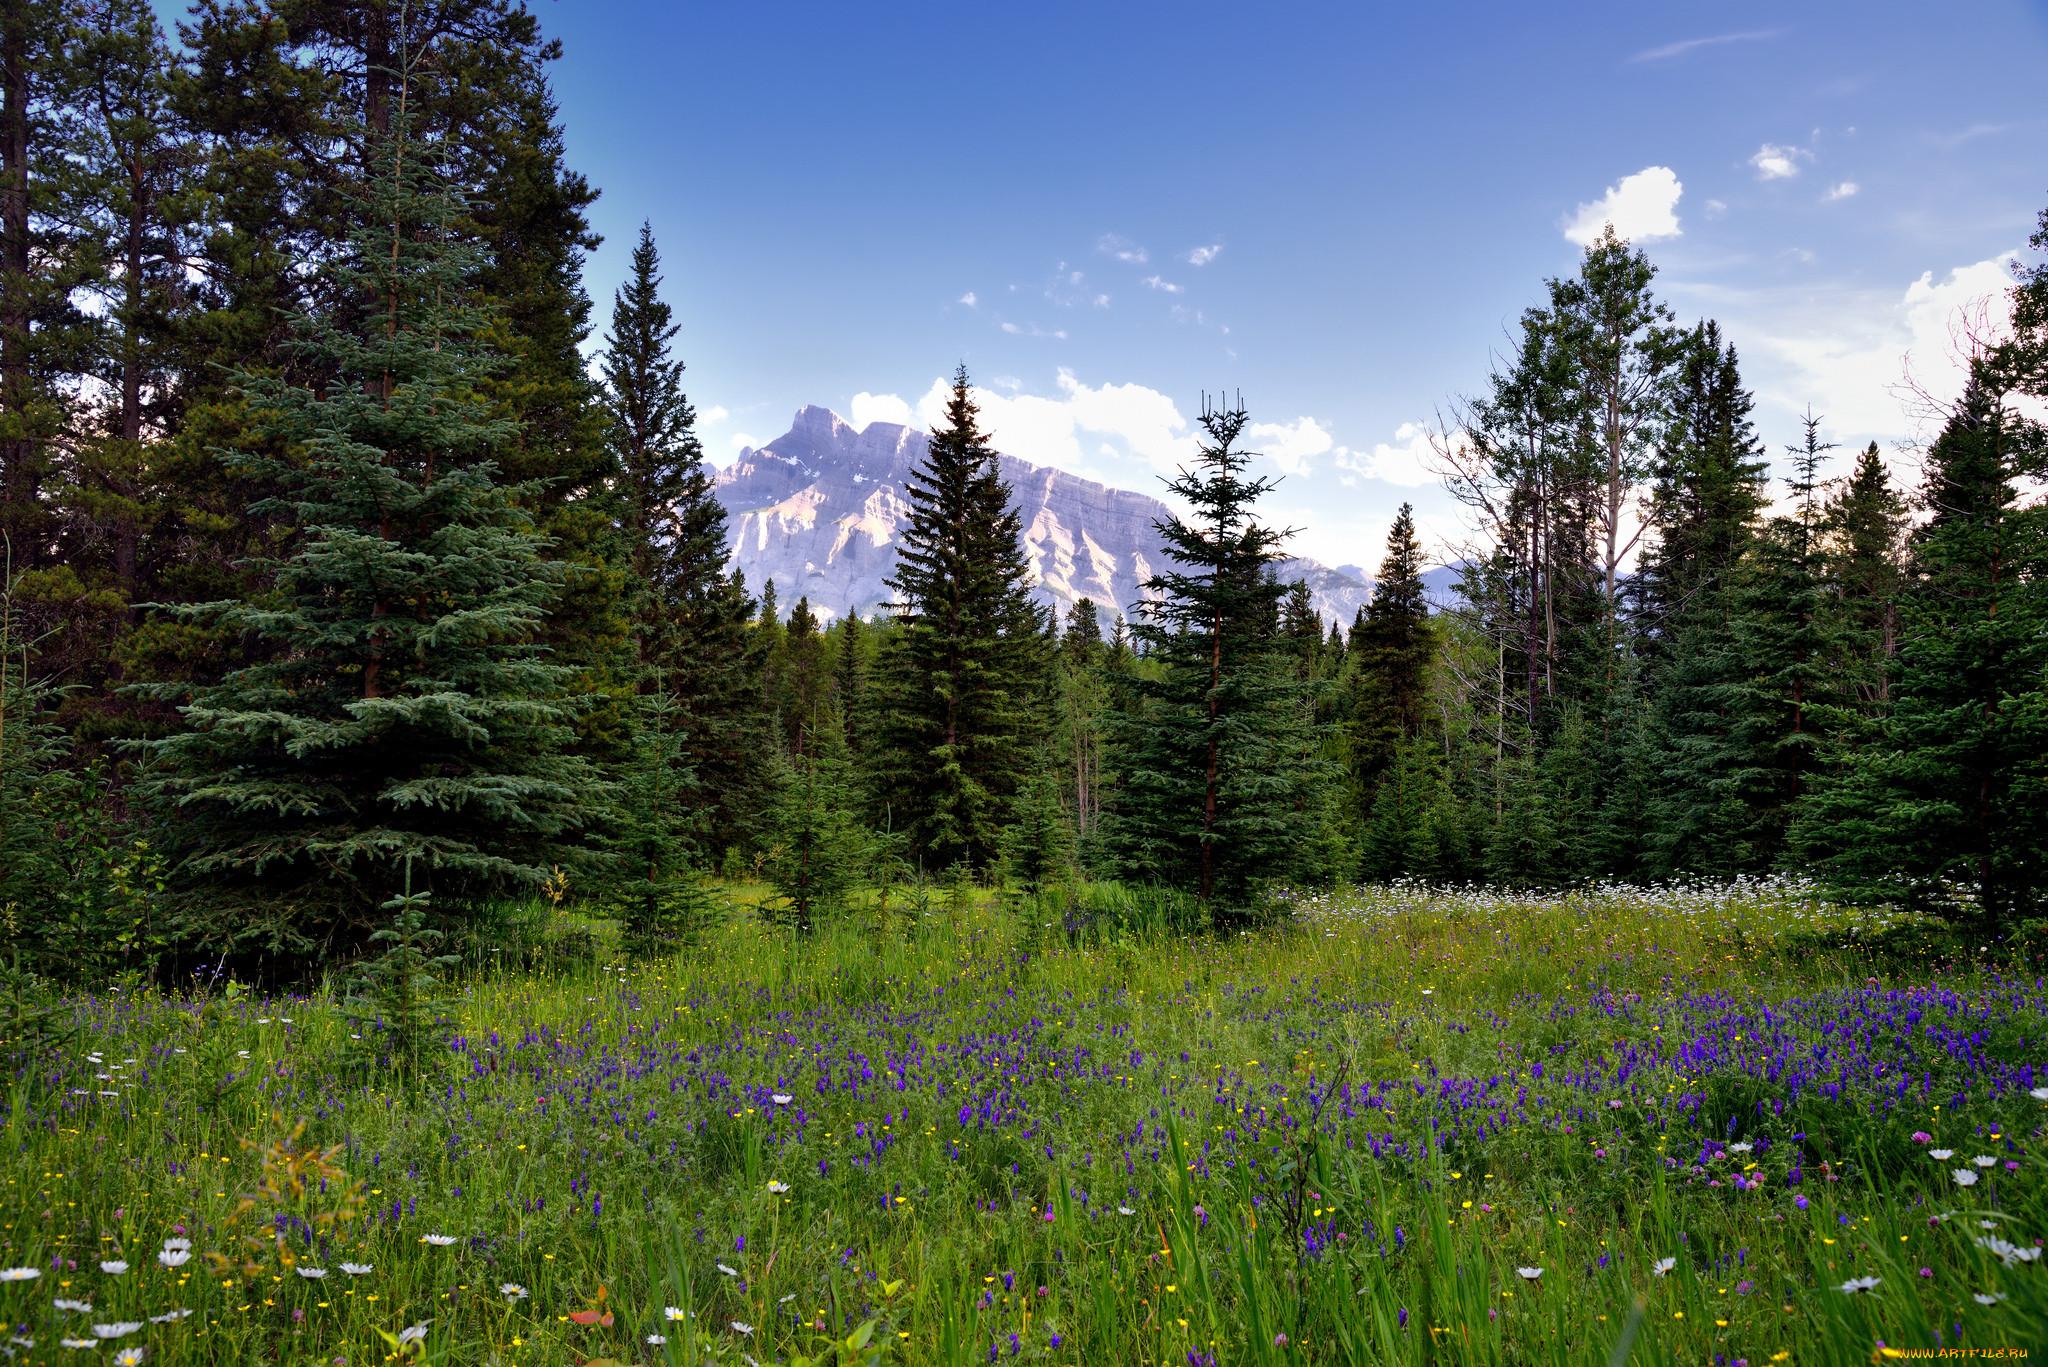 открытки лес поляна